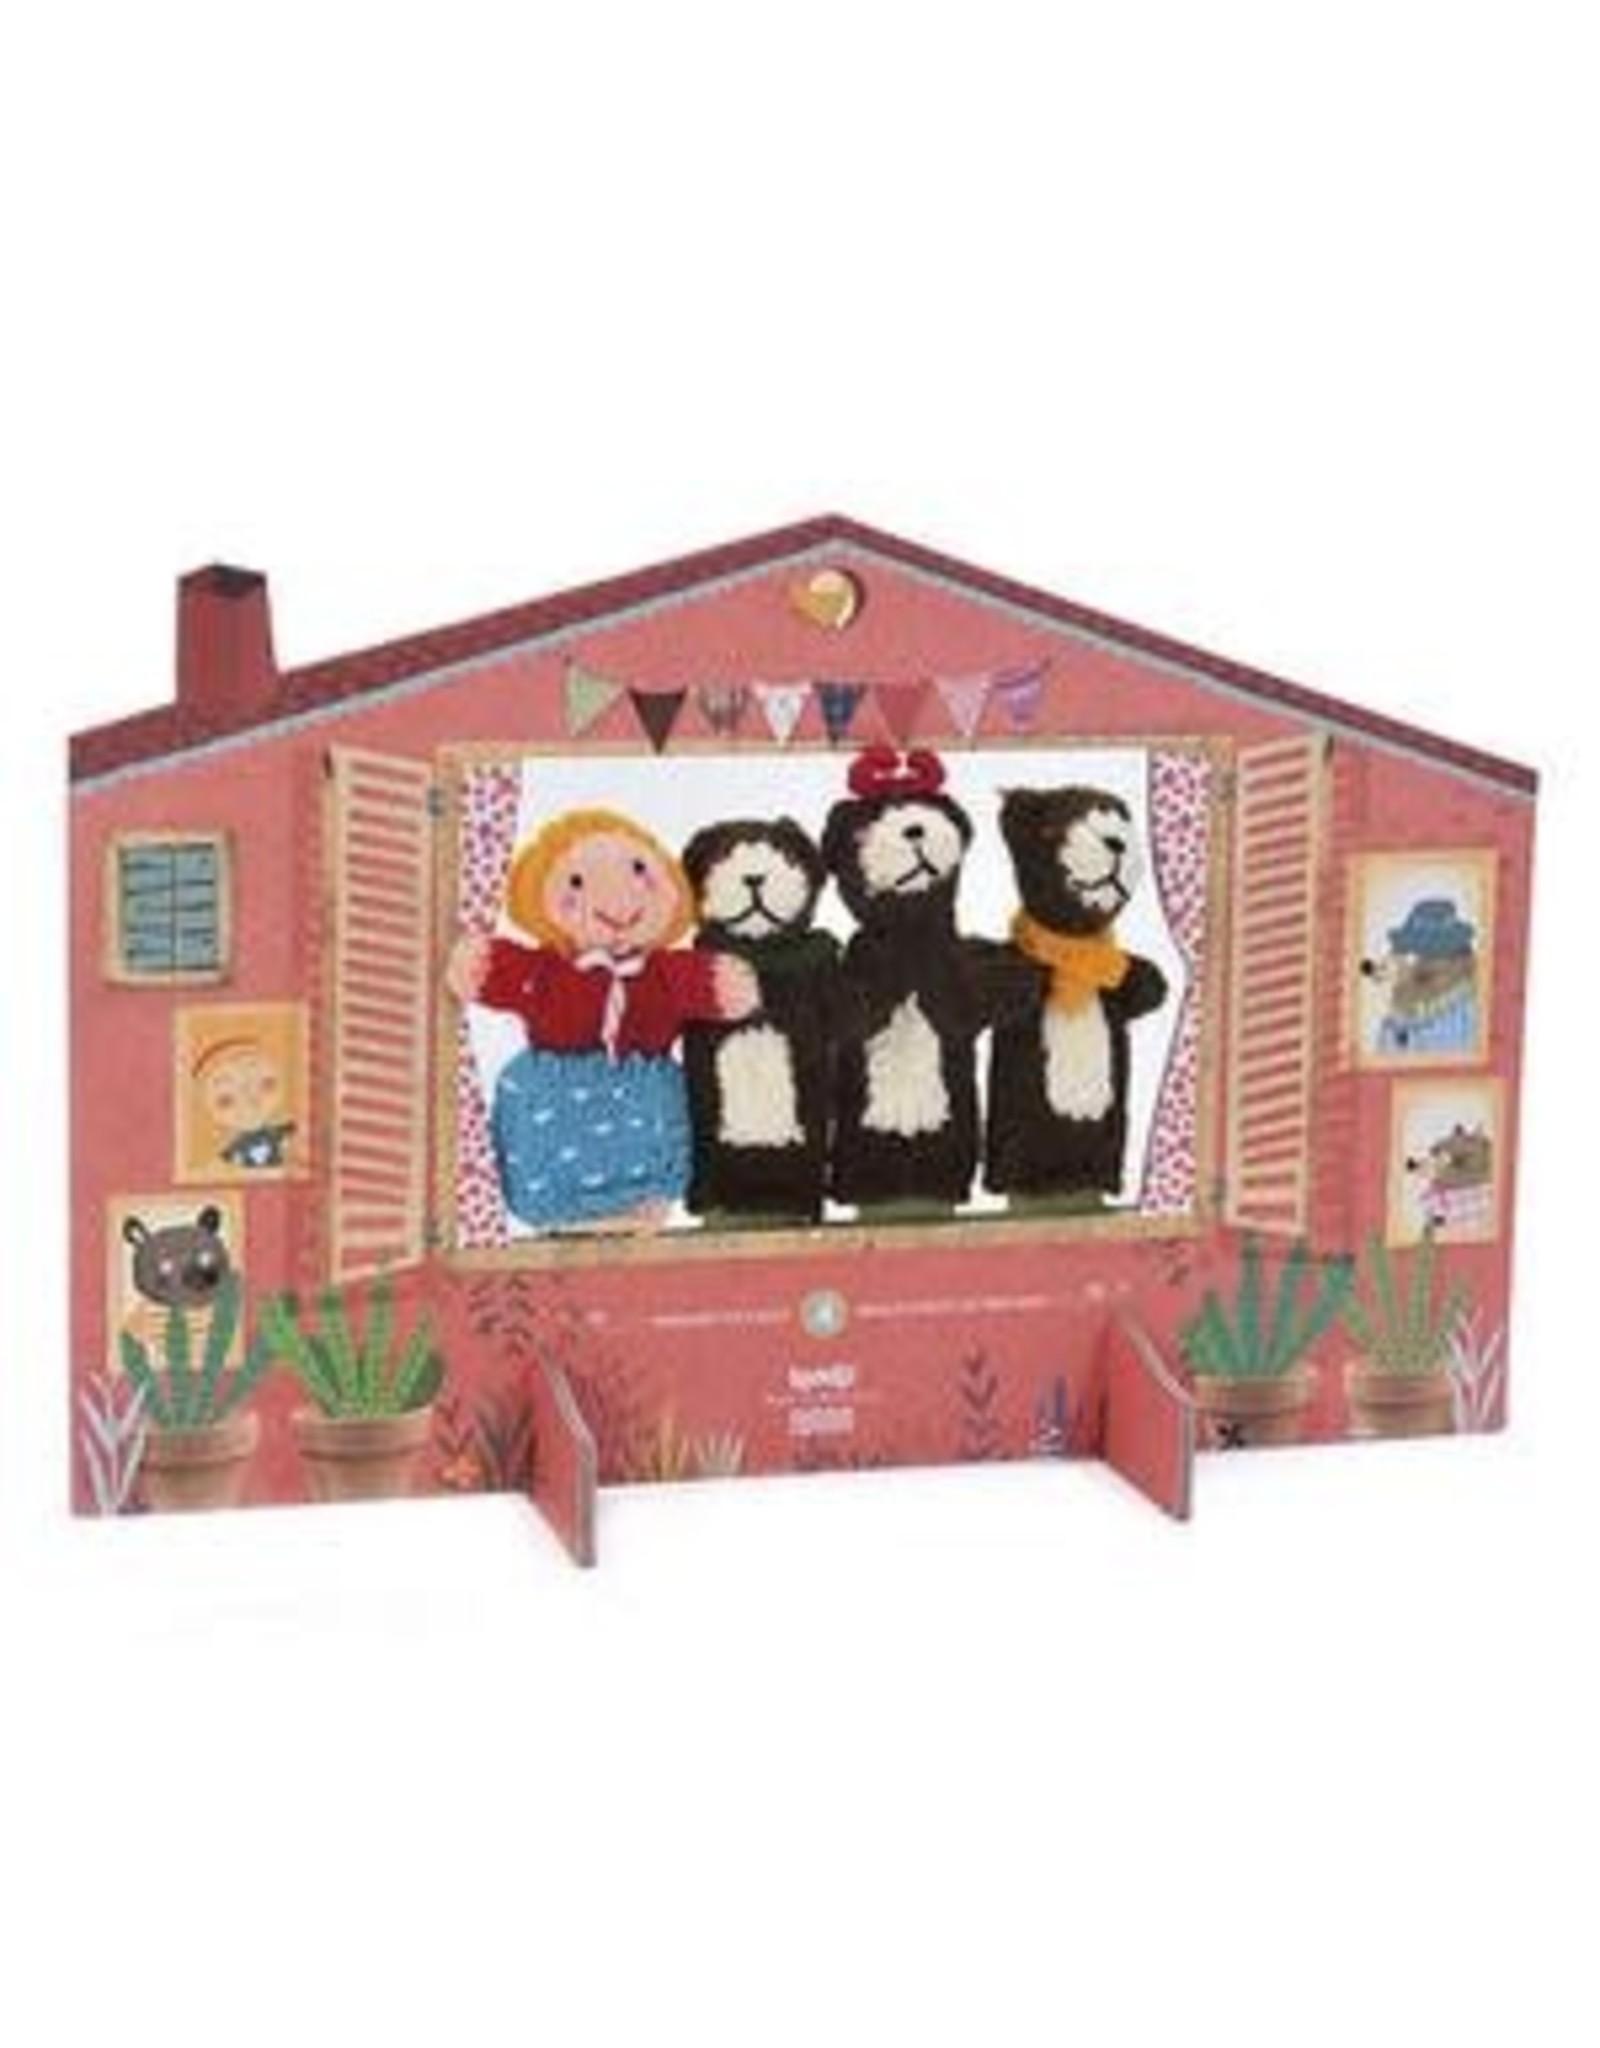 Iondji Finger Puppets - Goldilocks